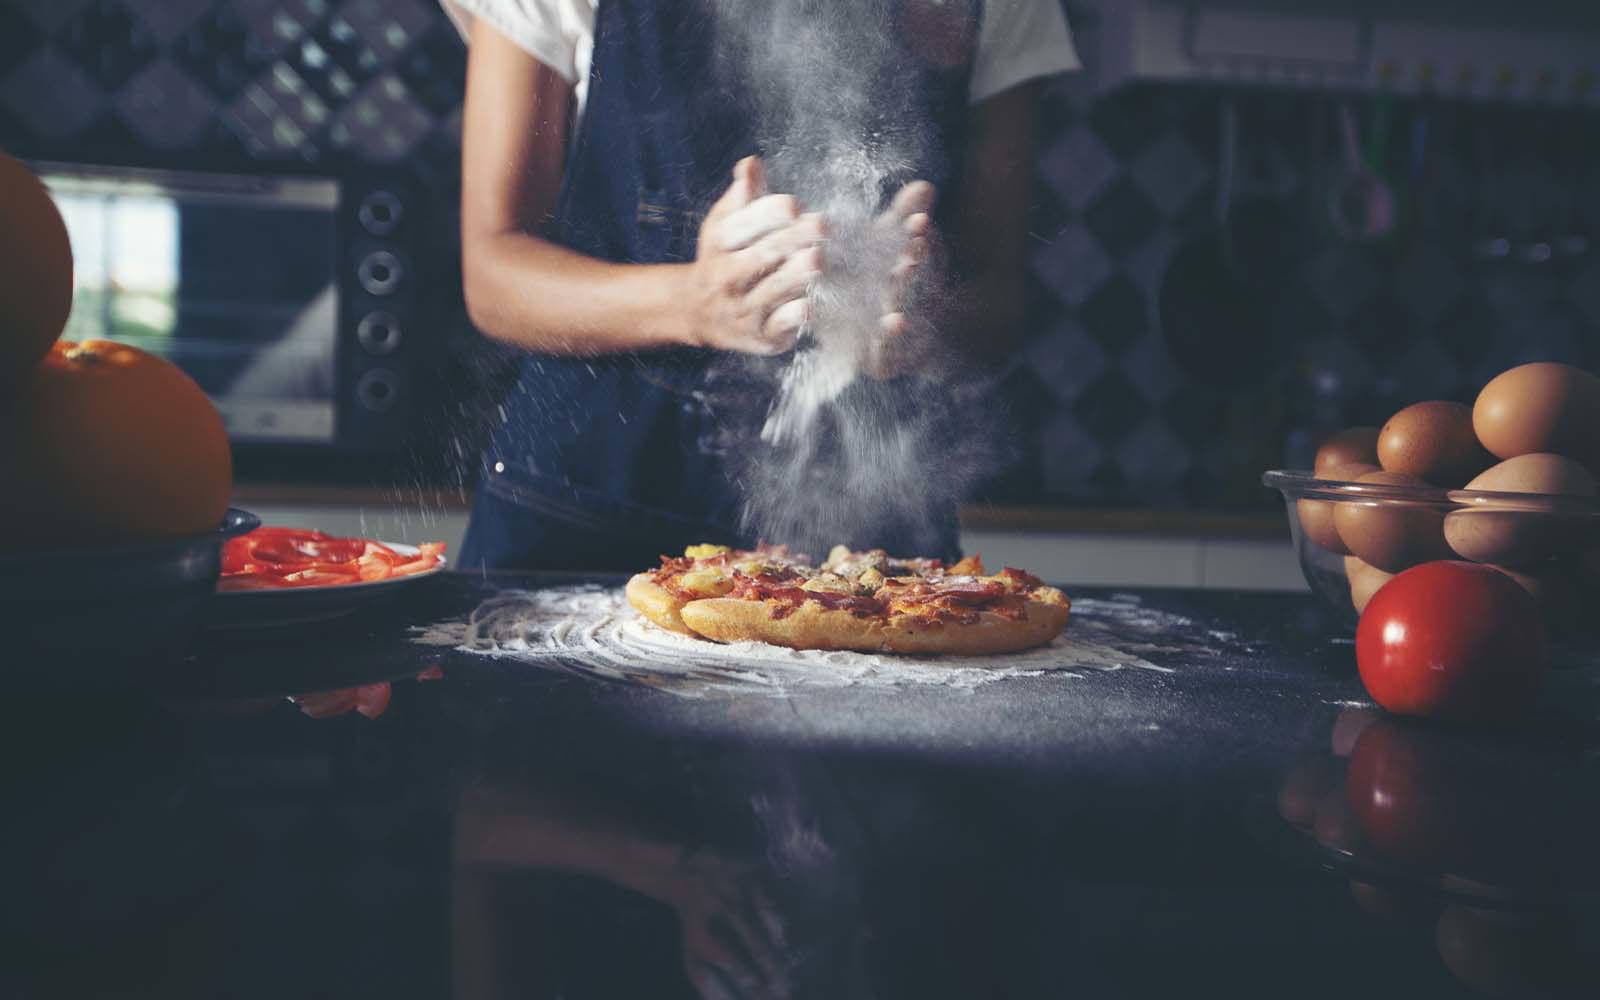 chefs hands dusting off flour